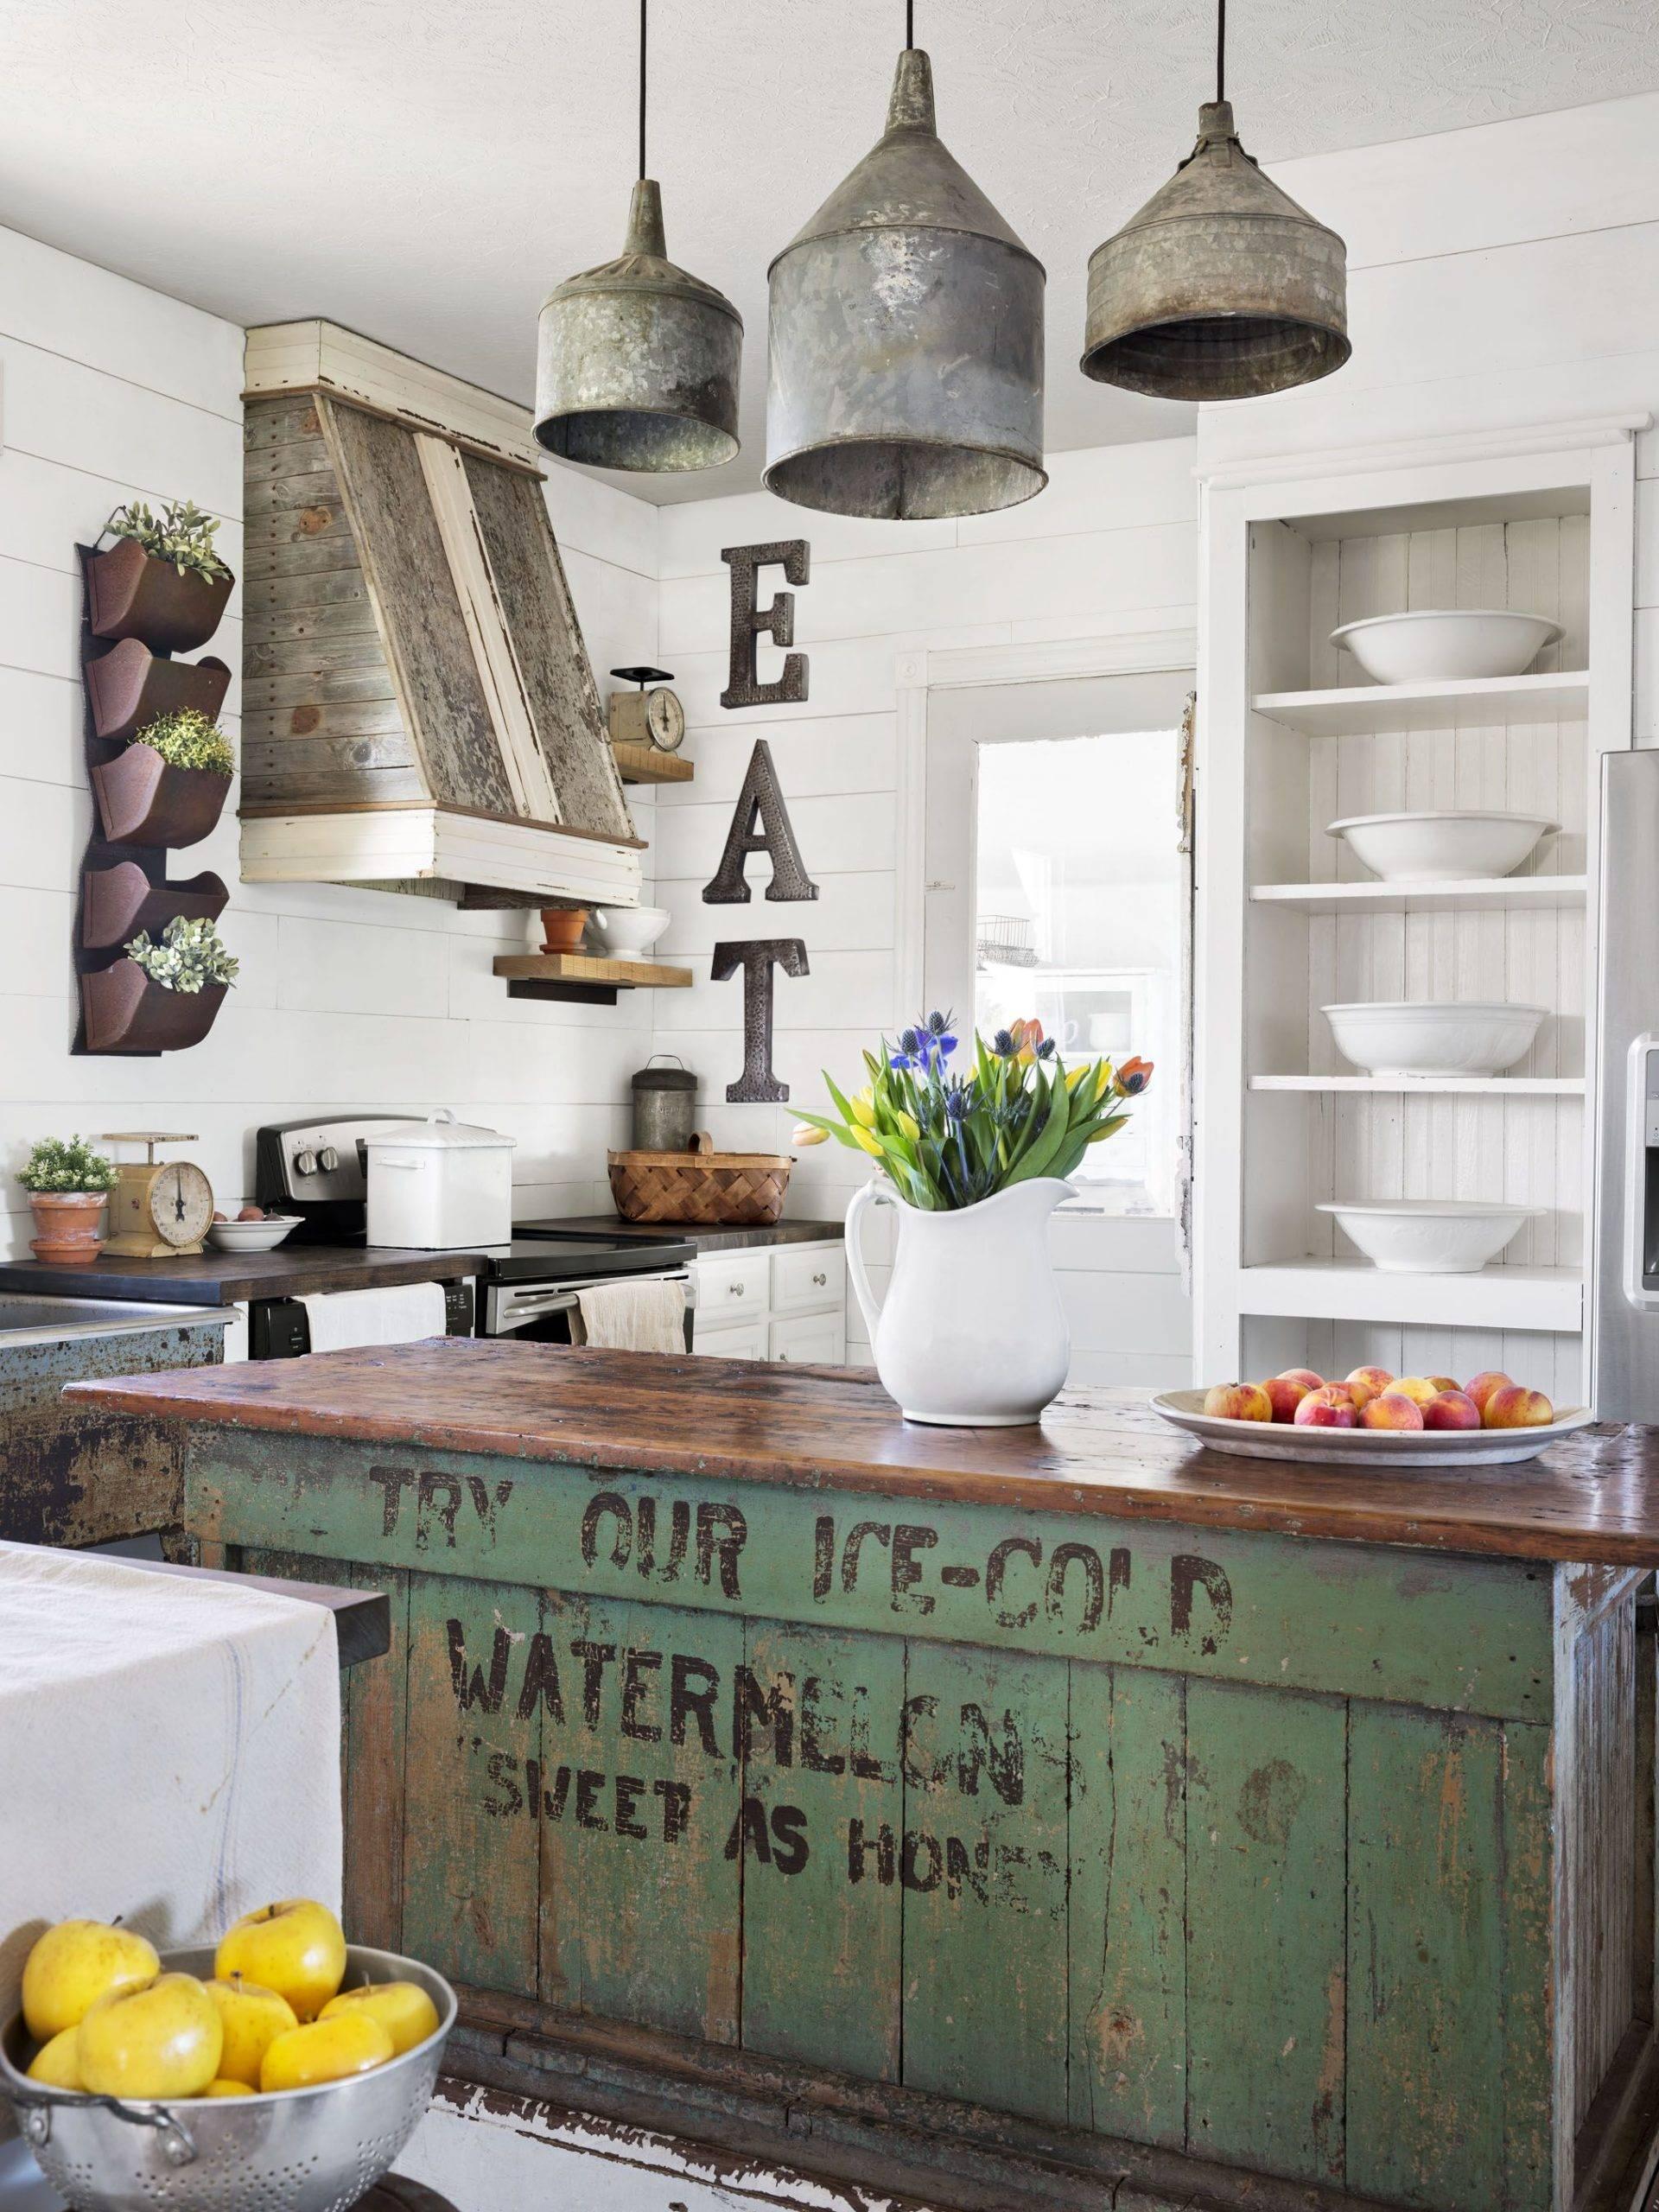 Old-Fashioned Kitchen Island.